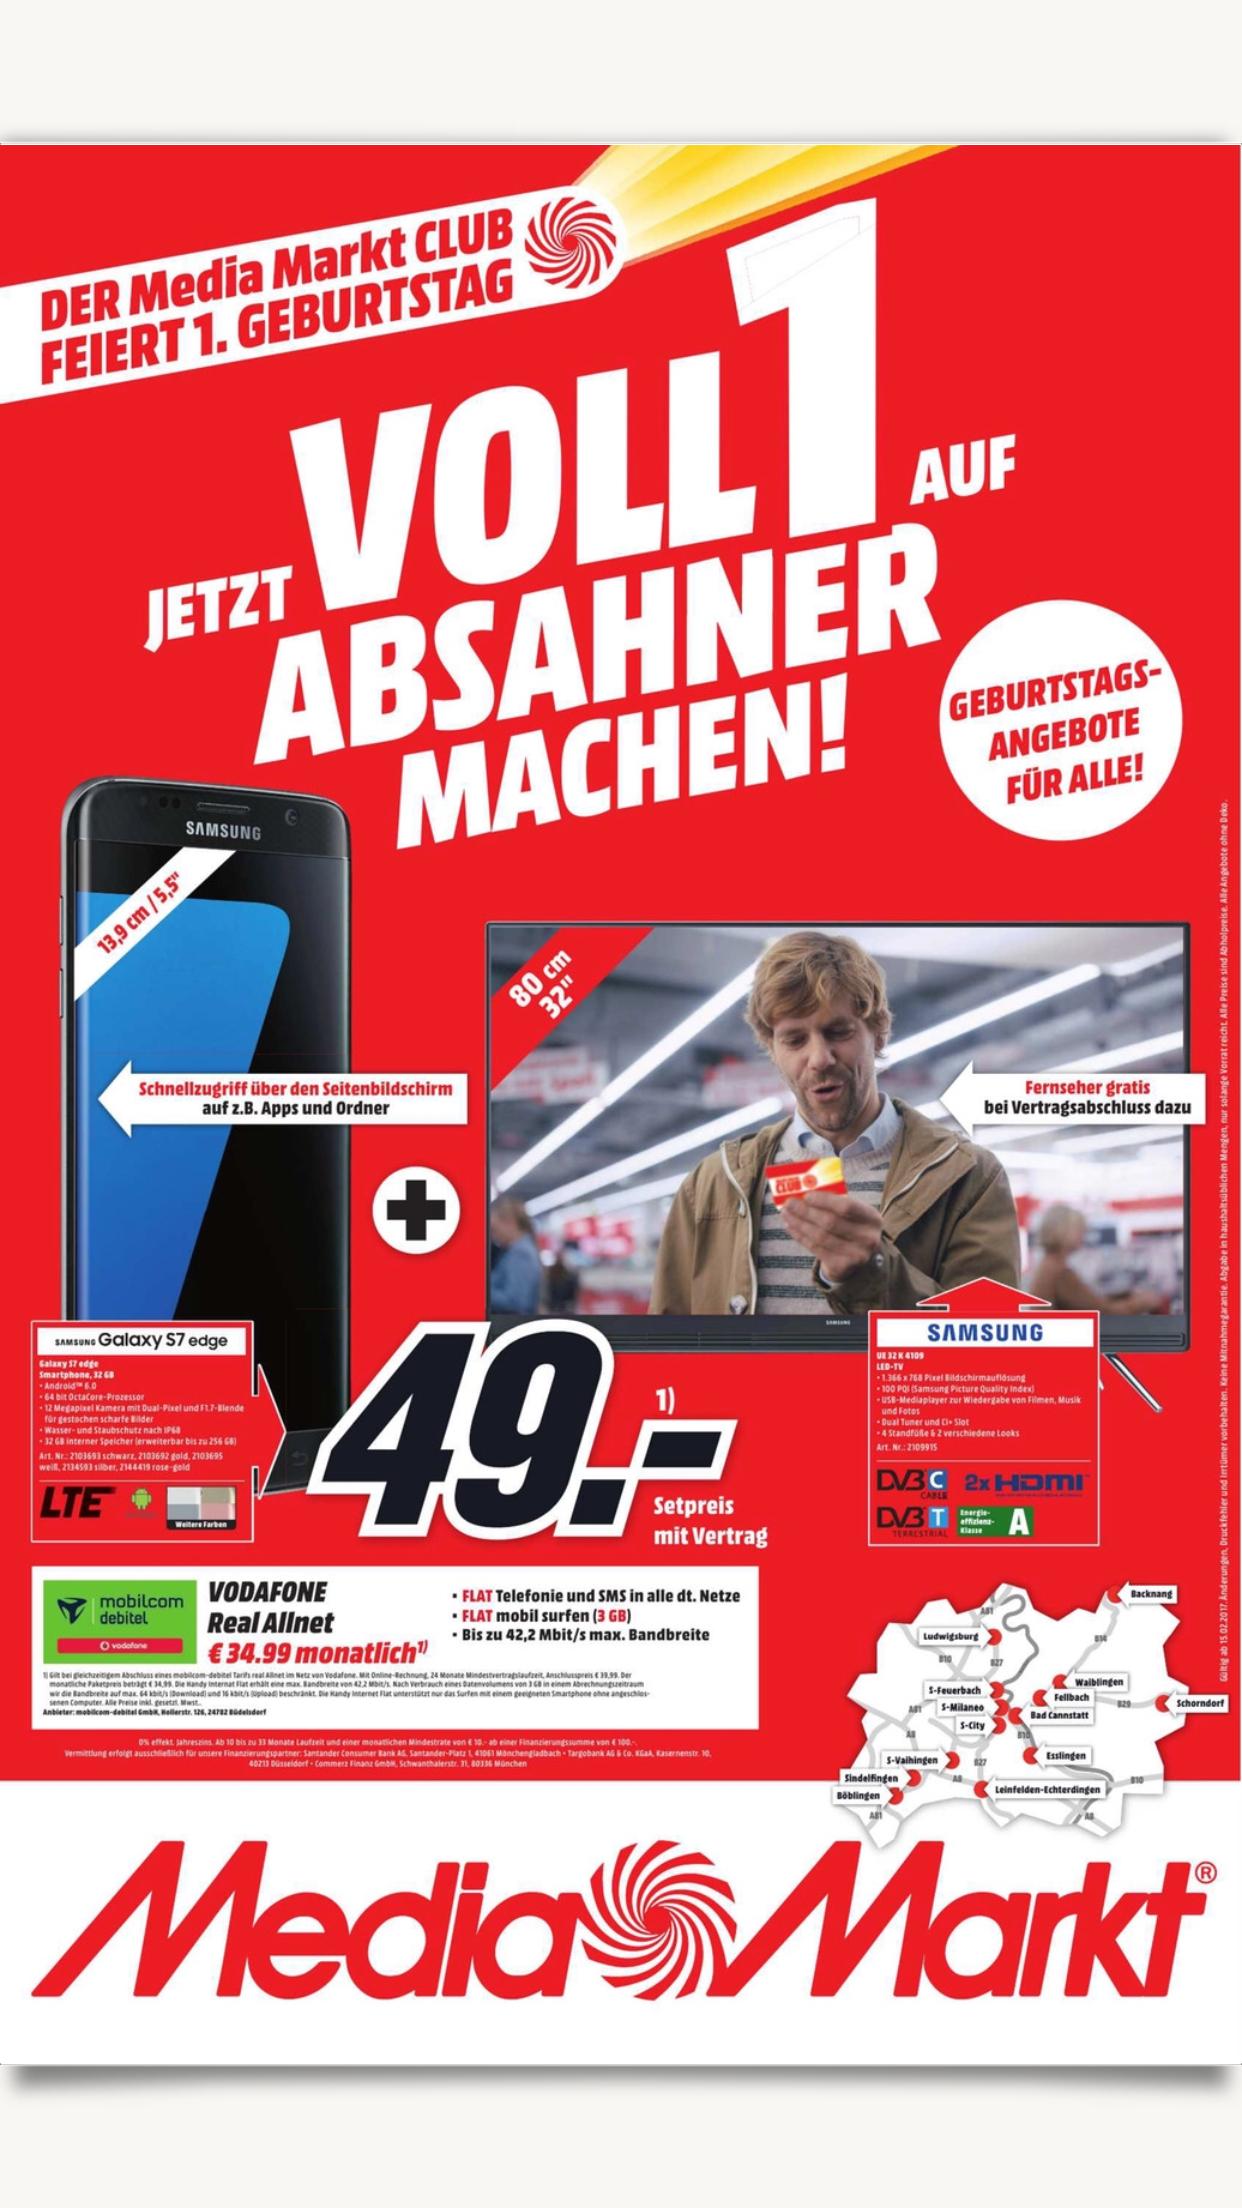 "LOKAL mehrere MediaMärkte in BW Samsung Galaxy S7 Edge + 32"" TV + Vodafone Allnet mit 3GB"